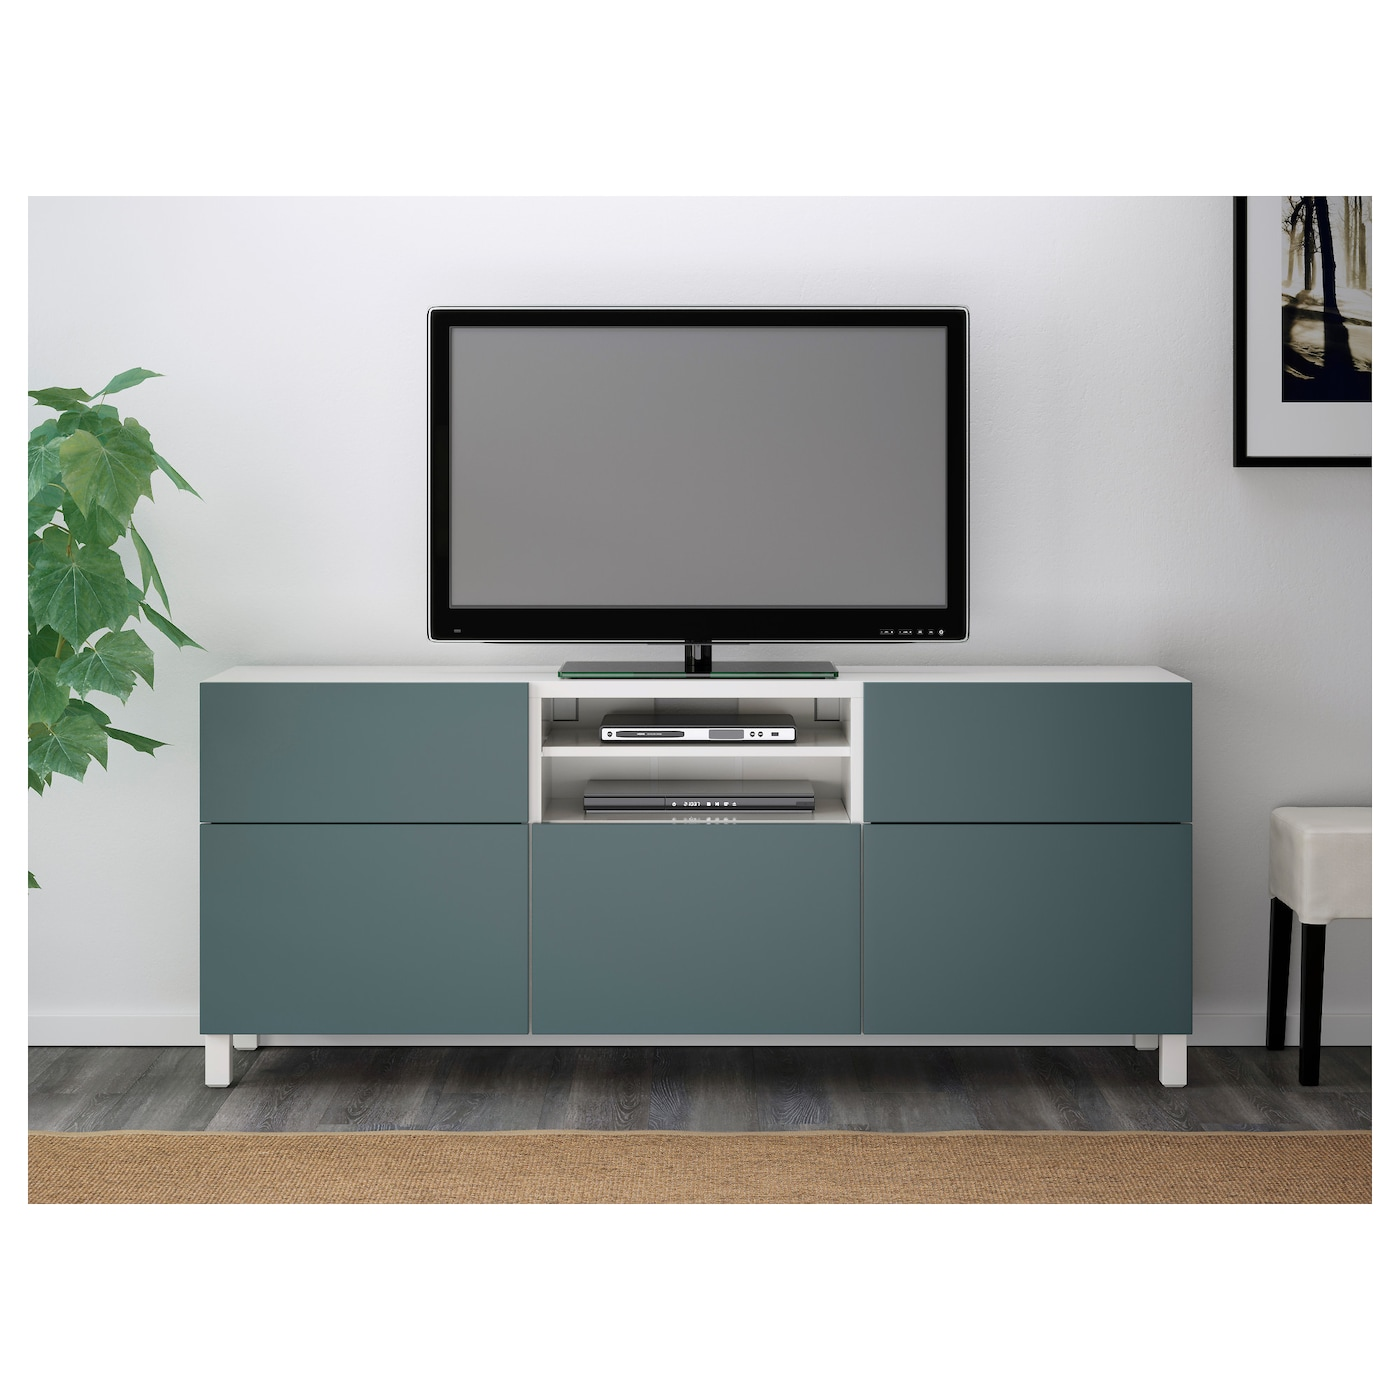 best banc tv blanc valviken gris turquoise 180x40x74 cm ikea. Black Bedroom Furniture Sets. Home Design Ideas